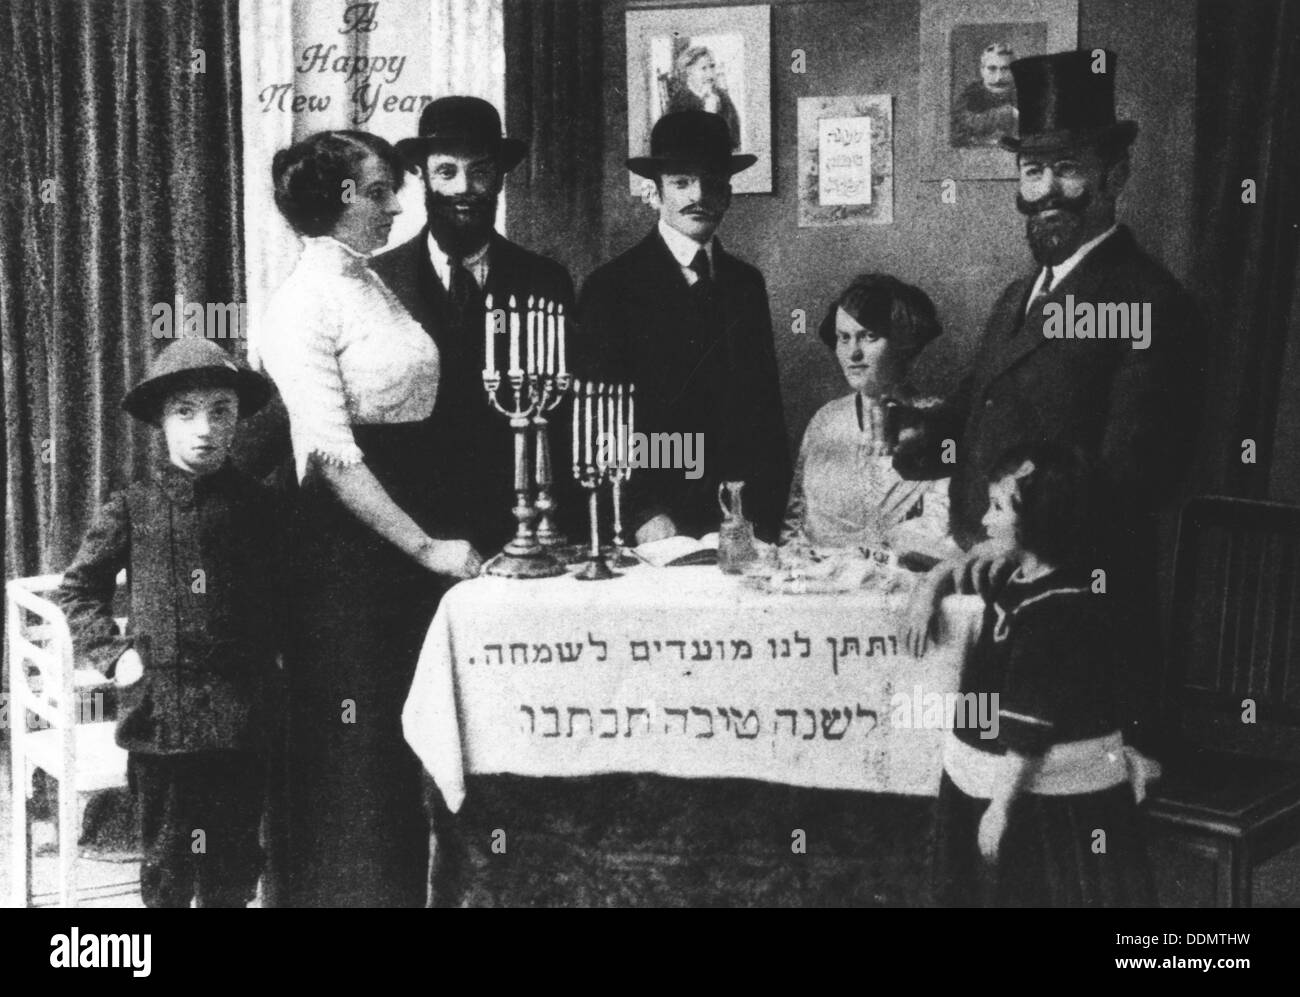 Jewish New Year card, American, 1890s. - Stock Image